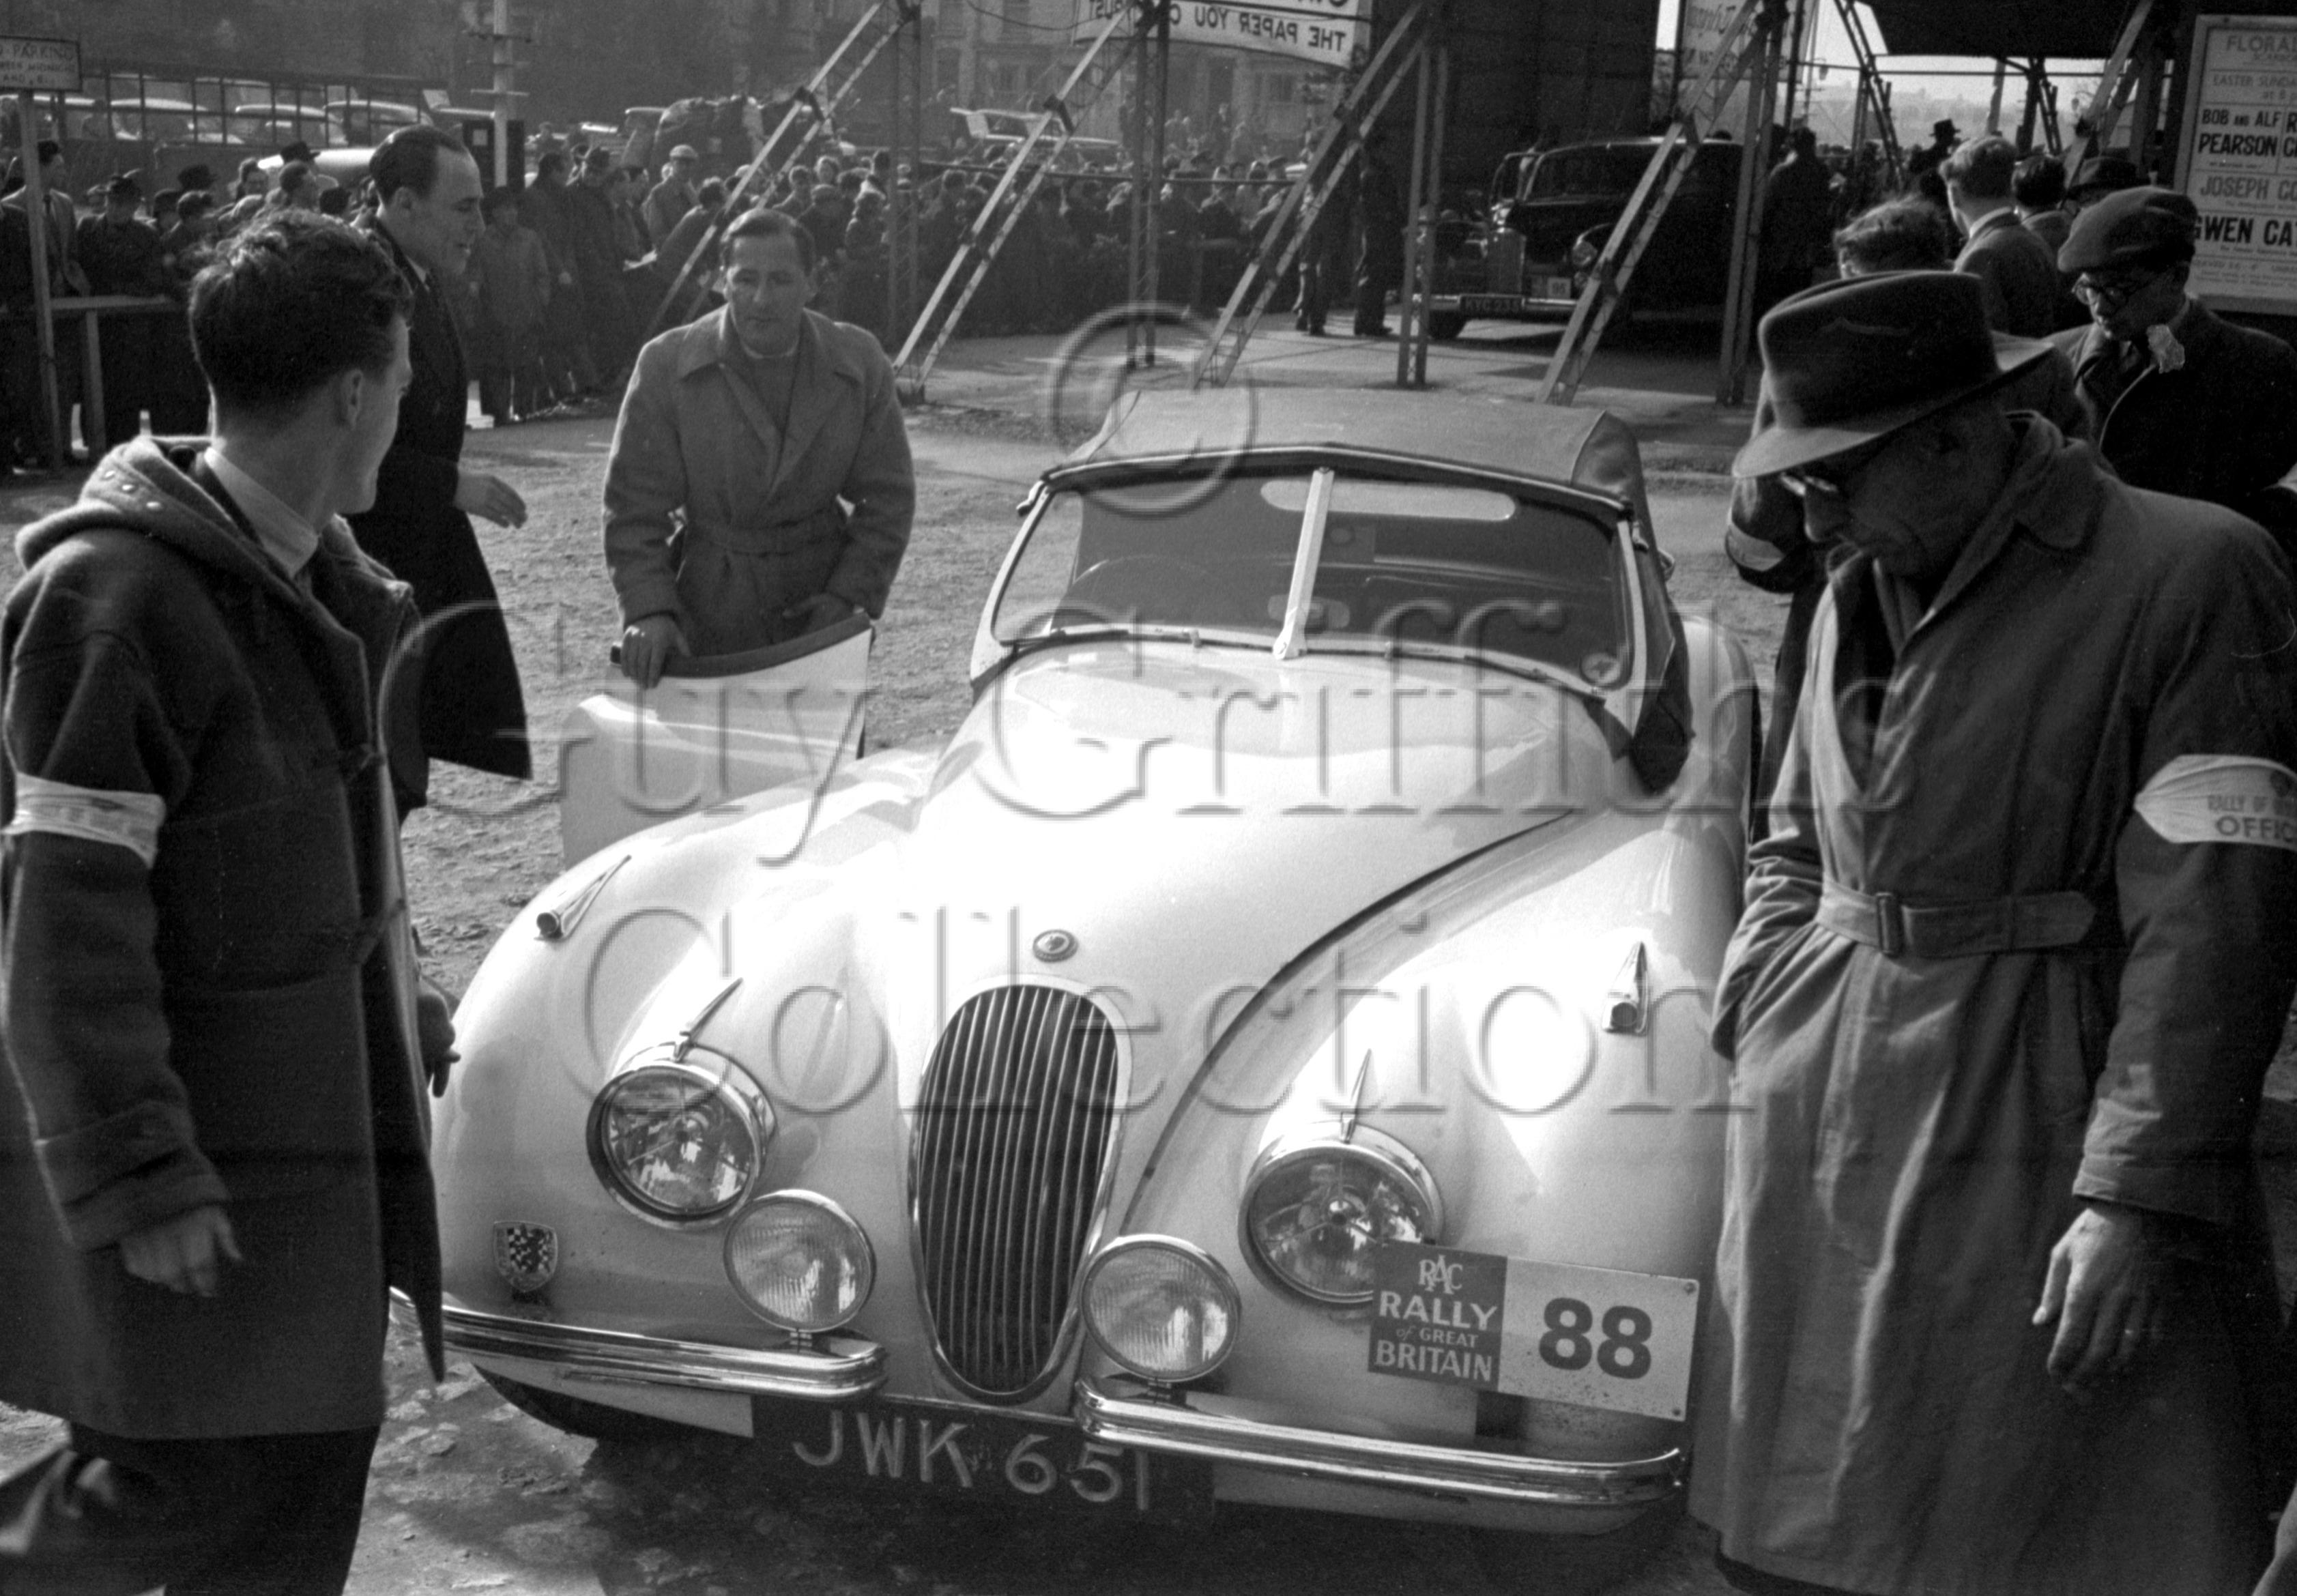 51-583–L-G-Johnson–Jaguar-XK-120-JWK-651–RAC-Rally–31-03-1952.jpg - Guy Griffiths Collection